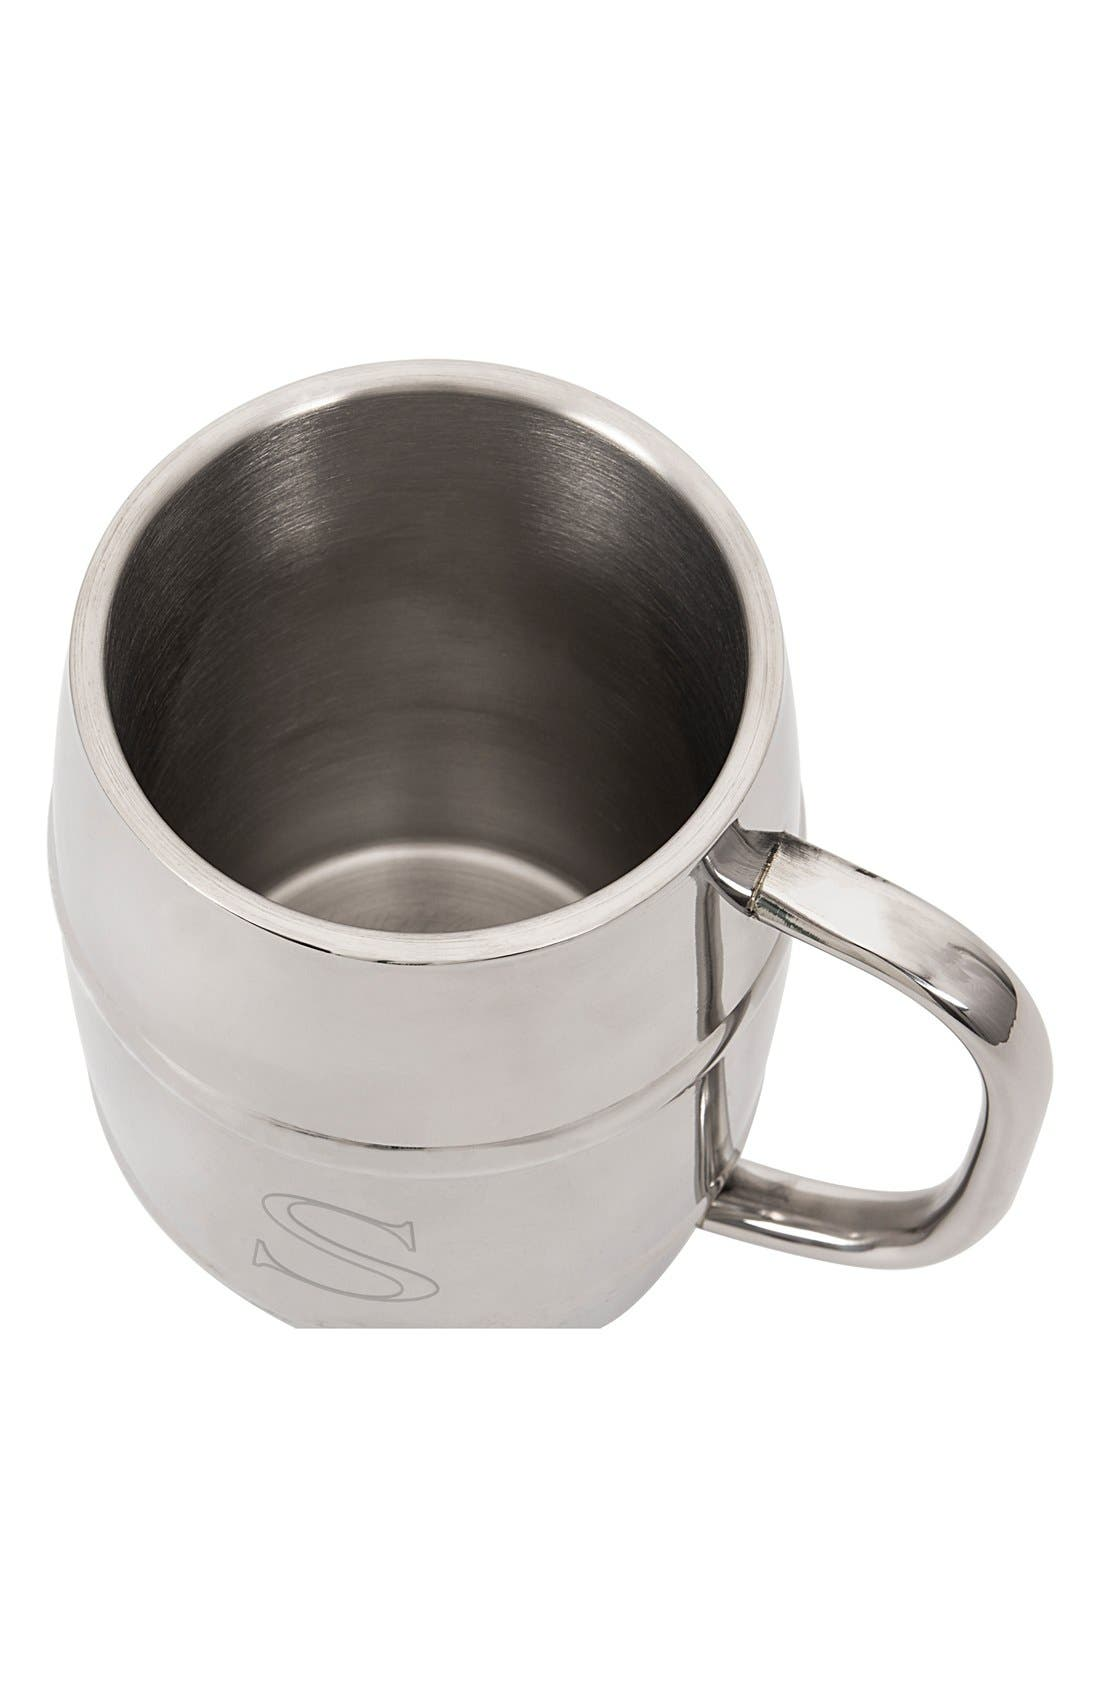 Alternate Image 3  - Cathy's Concepts 'XL Beer Keg' Monogram Mug